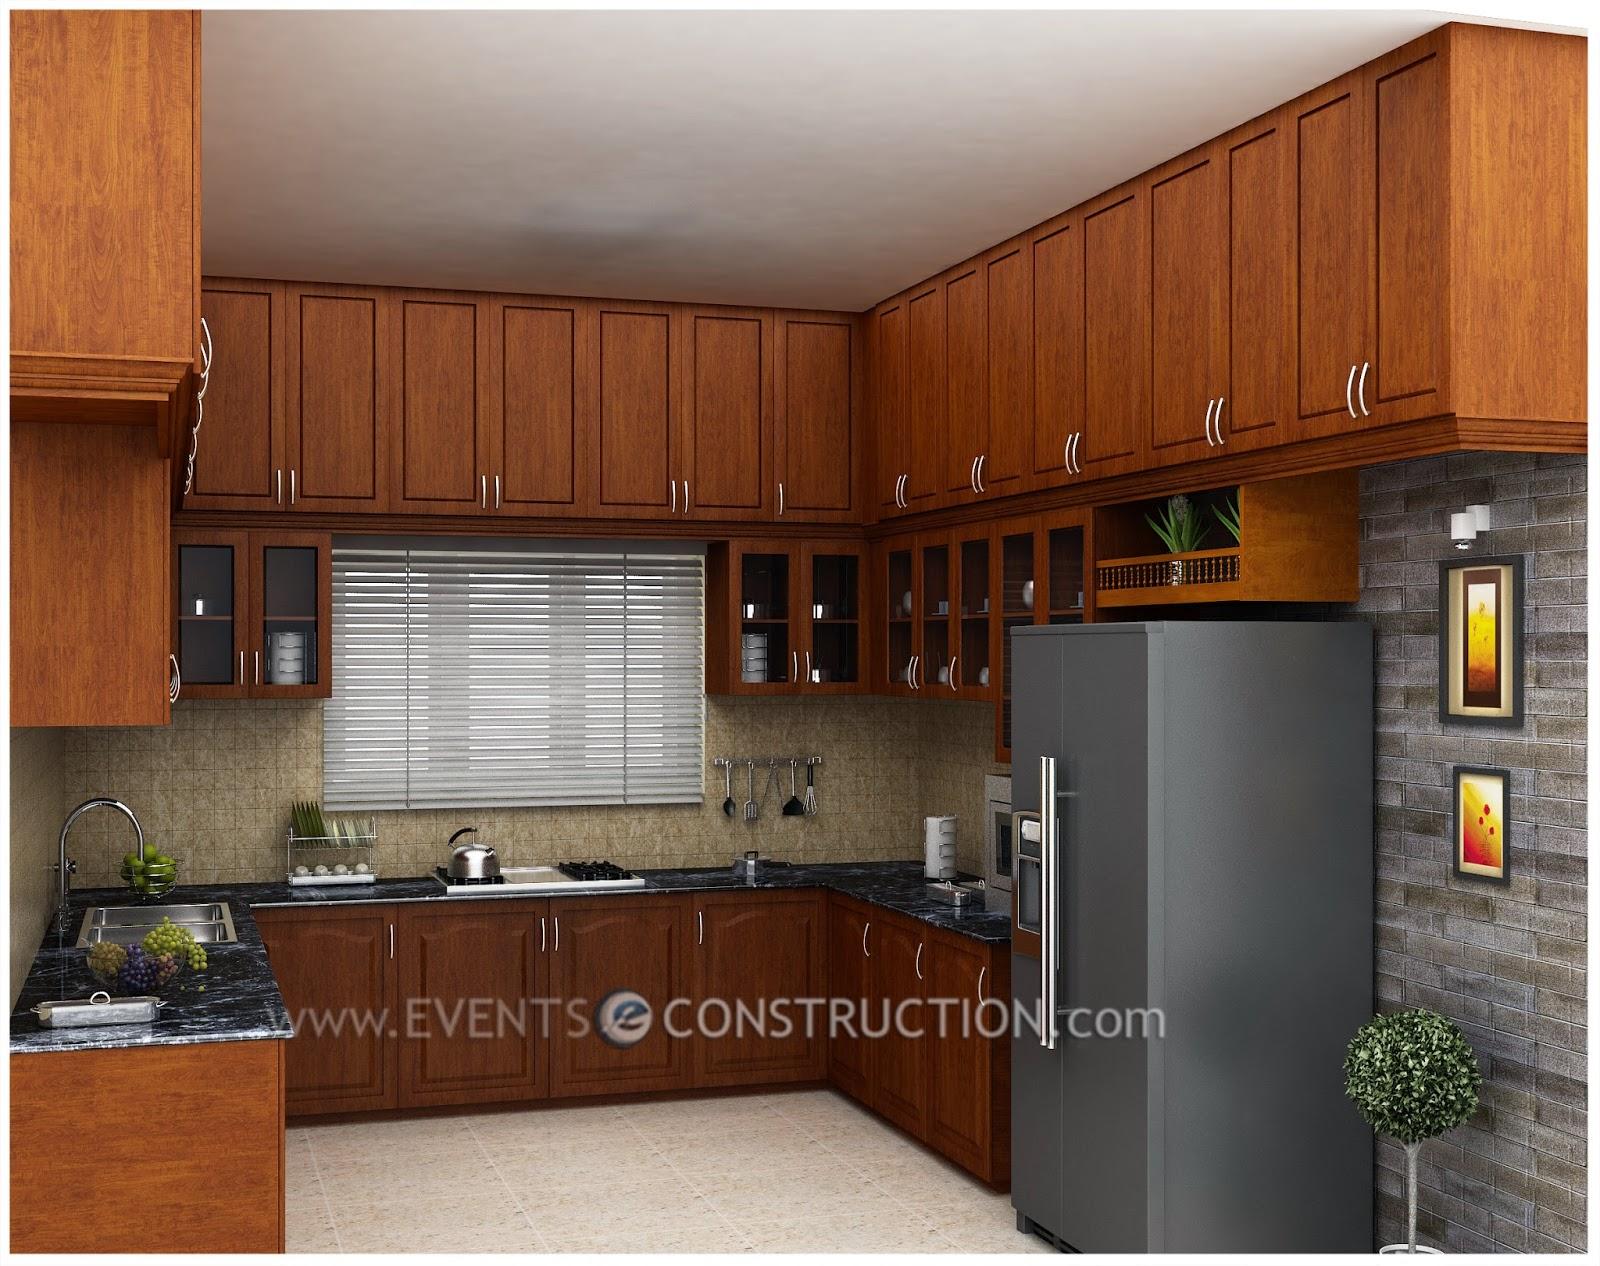 Kerala Kitchen | Joy Studio Design Gallery - Best Design